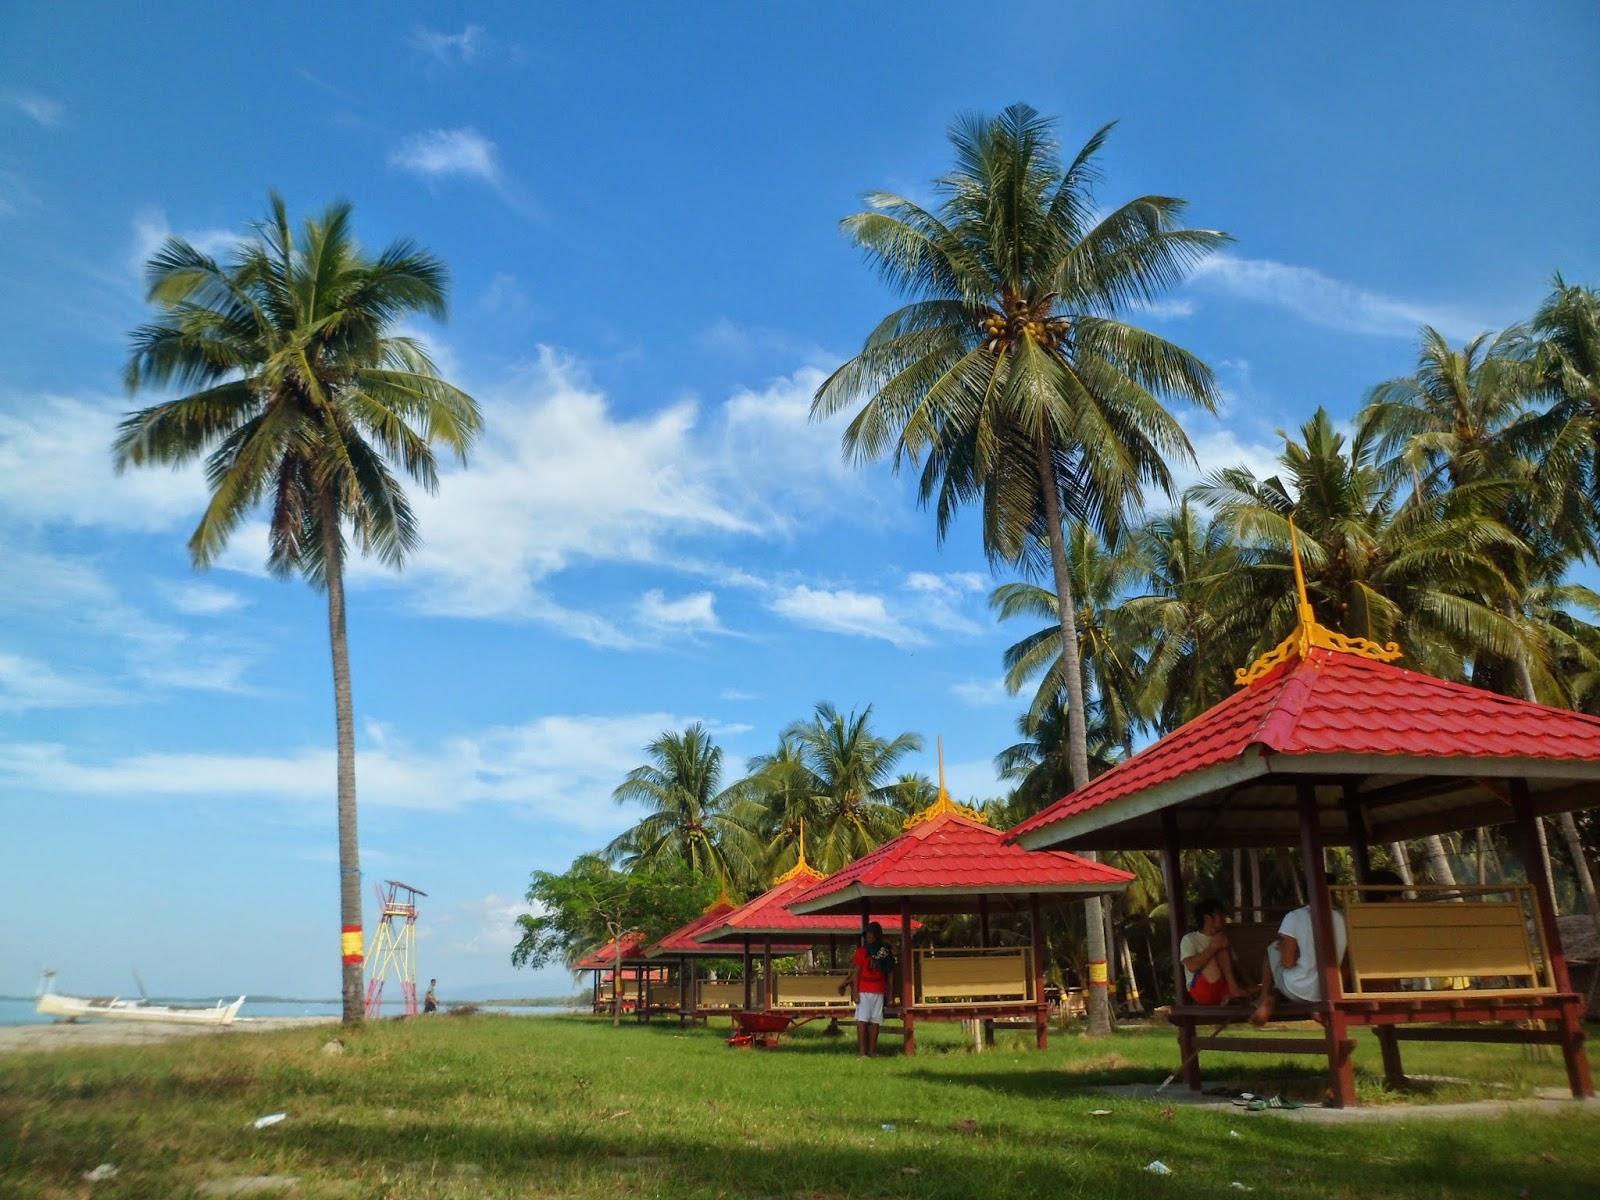 15 Tempat Wisata Terpopuler Sulawesi Barat Indonesia Wanawisata Pantai Mampie